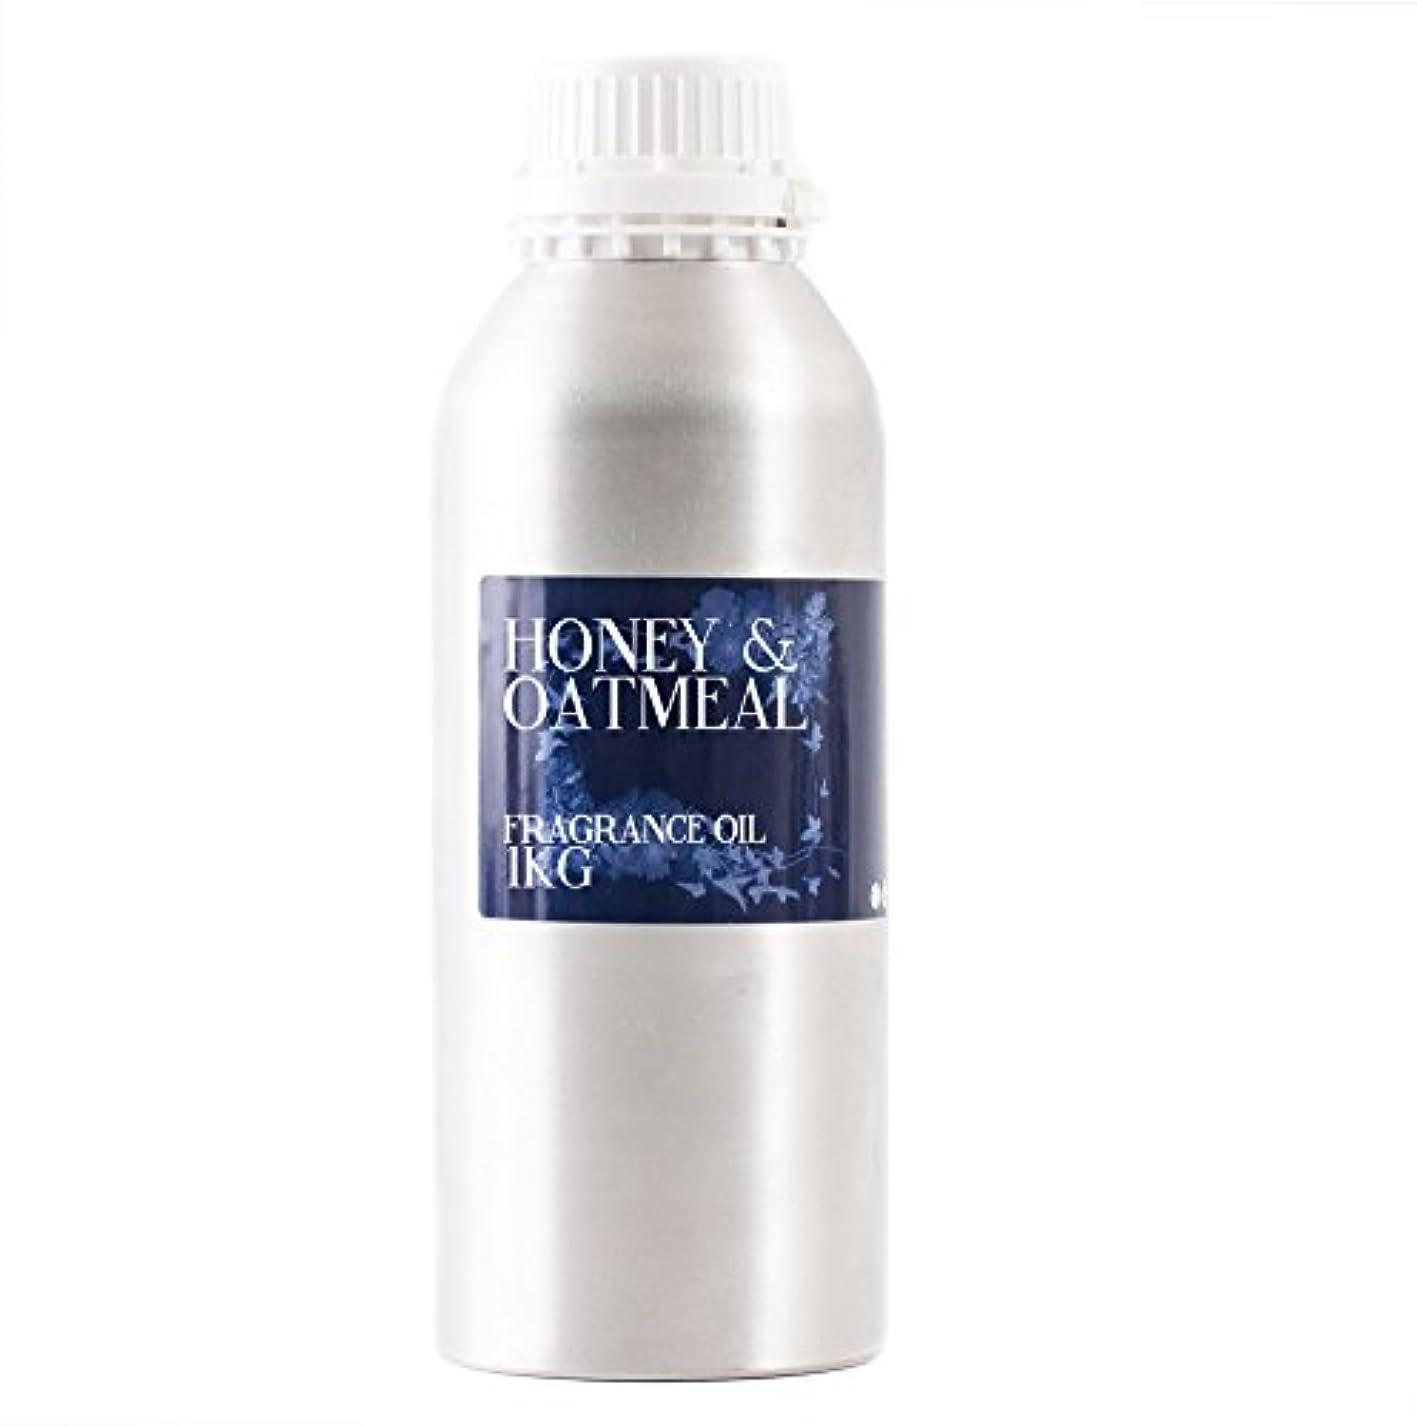 Mystic Moments | Honey & Oatmeal Fragrance Oil - 1Kg